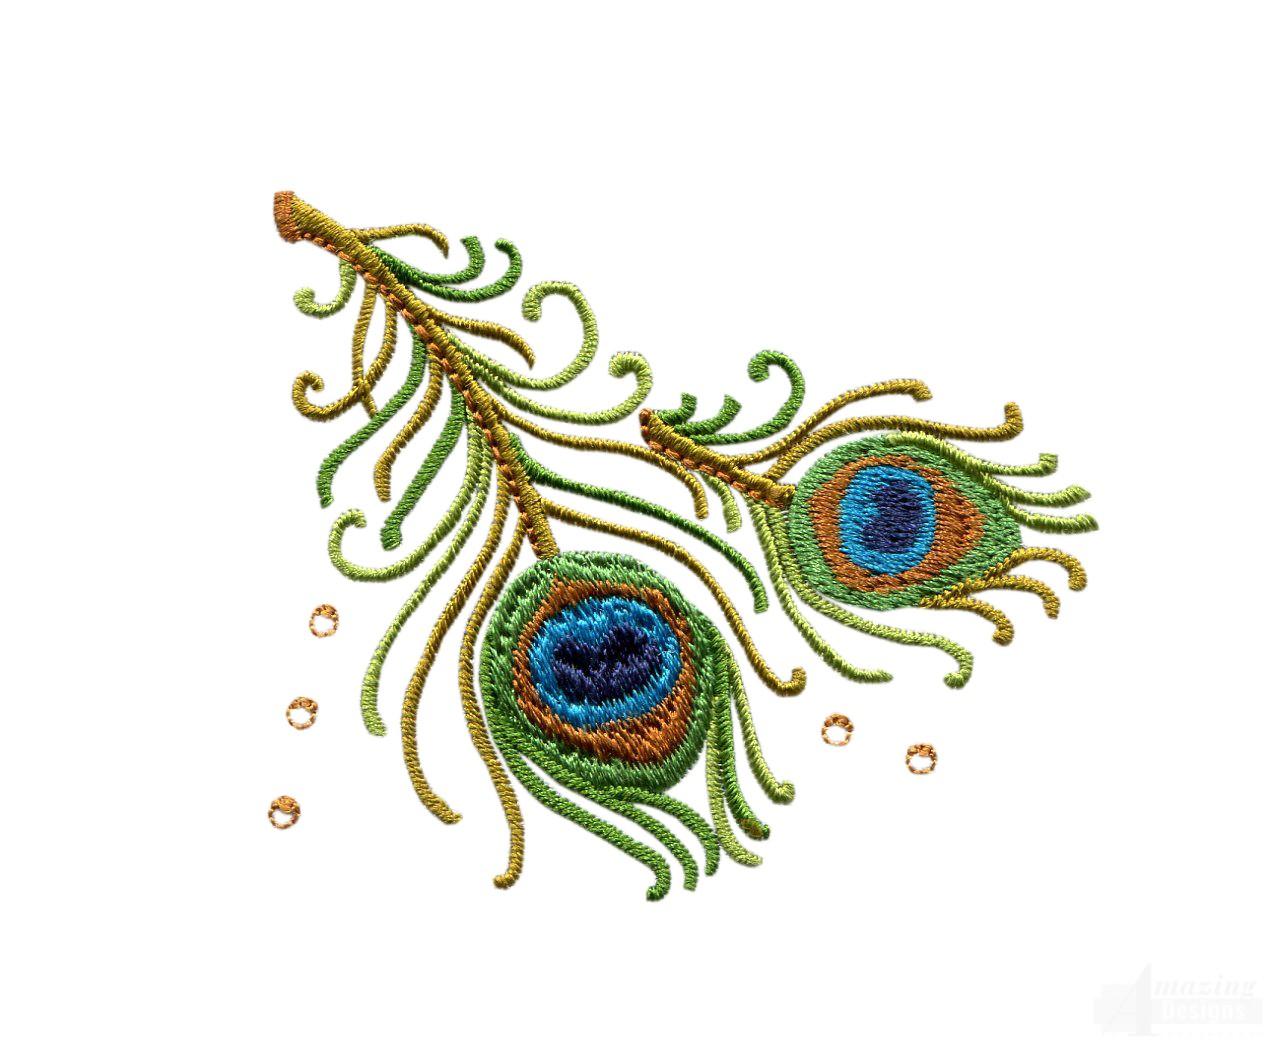 Tokyo Bunka Shishu 456 Peacock Japanese Punch Embroidery Kit